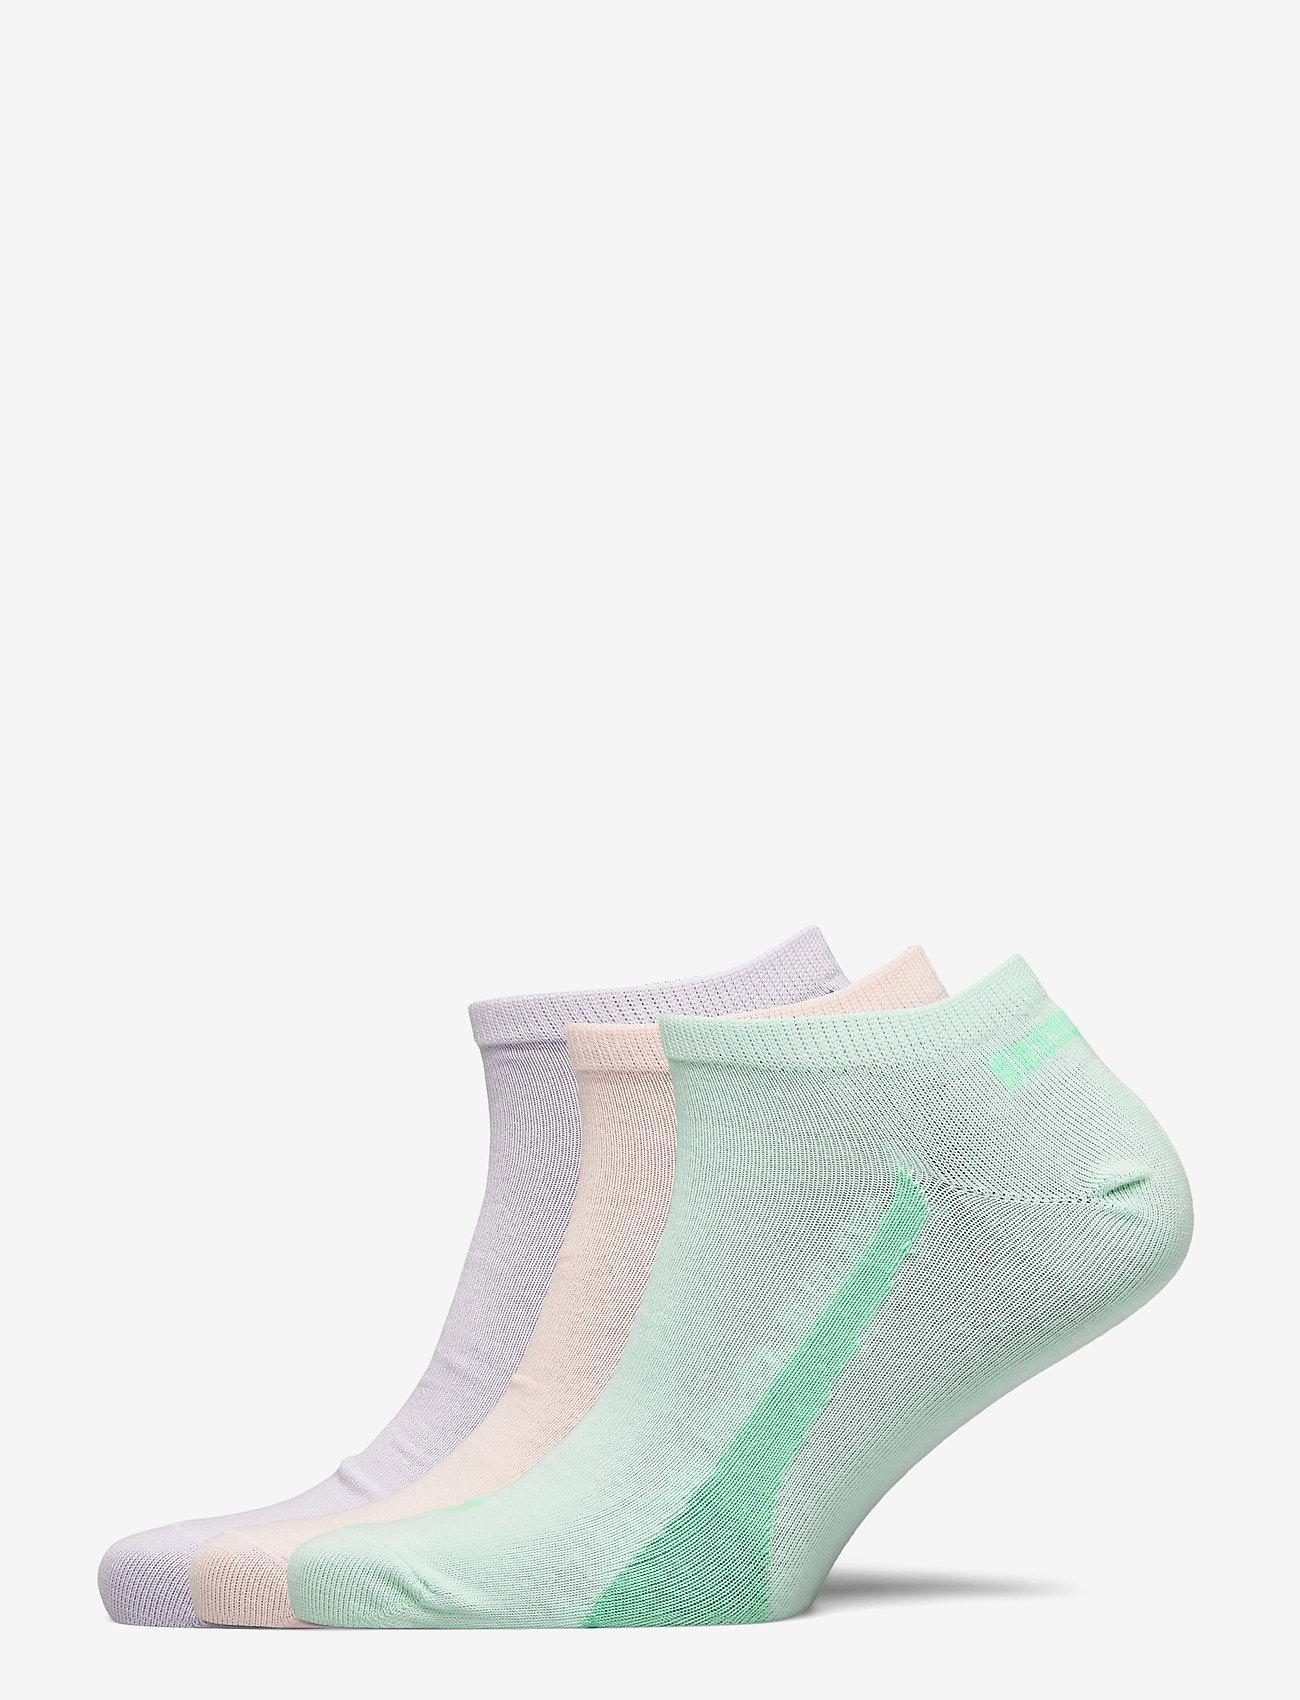 PUMA - PUMA UNISEX LIFESTYLE SNEAKERS 3P - kousen - mixed colors - 0